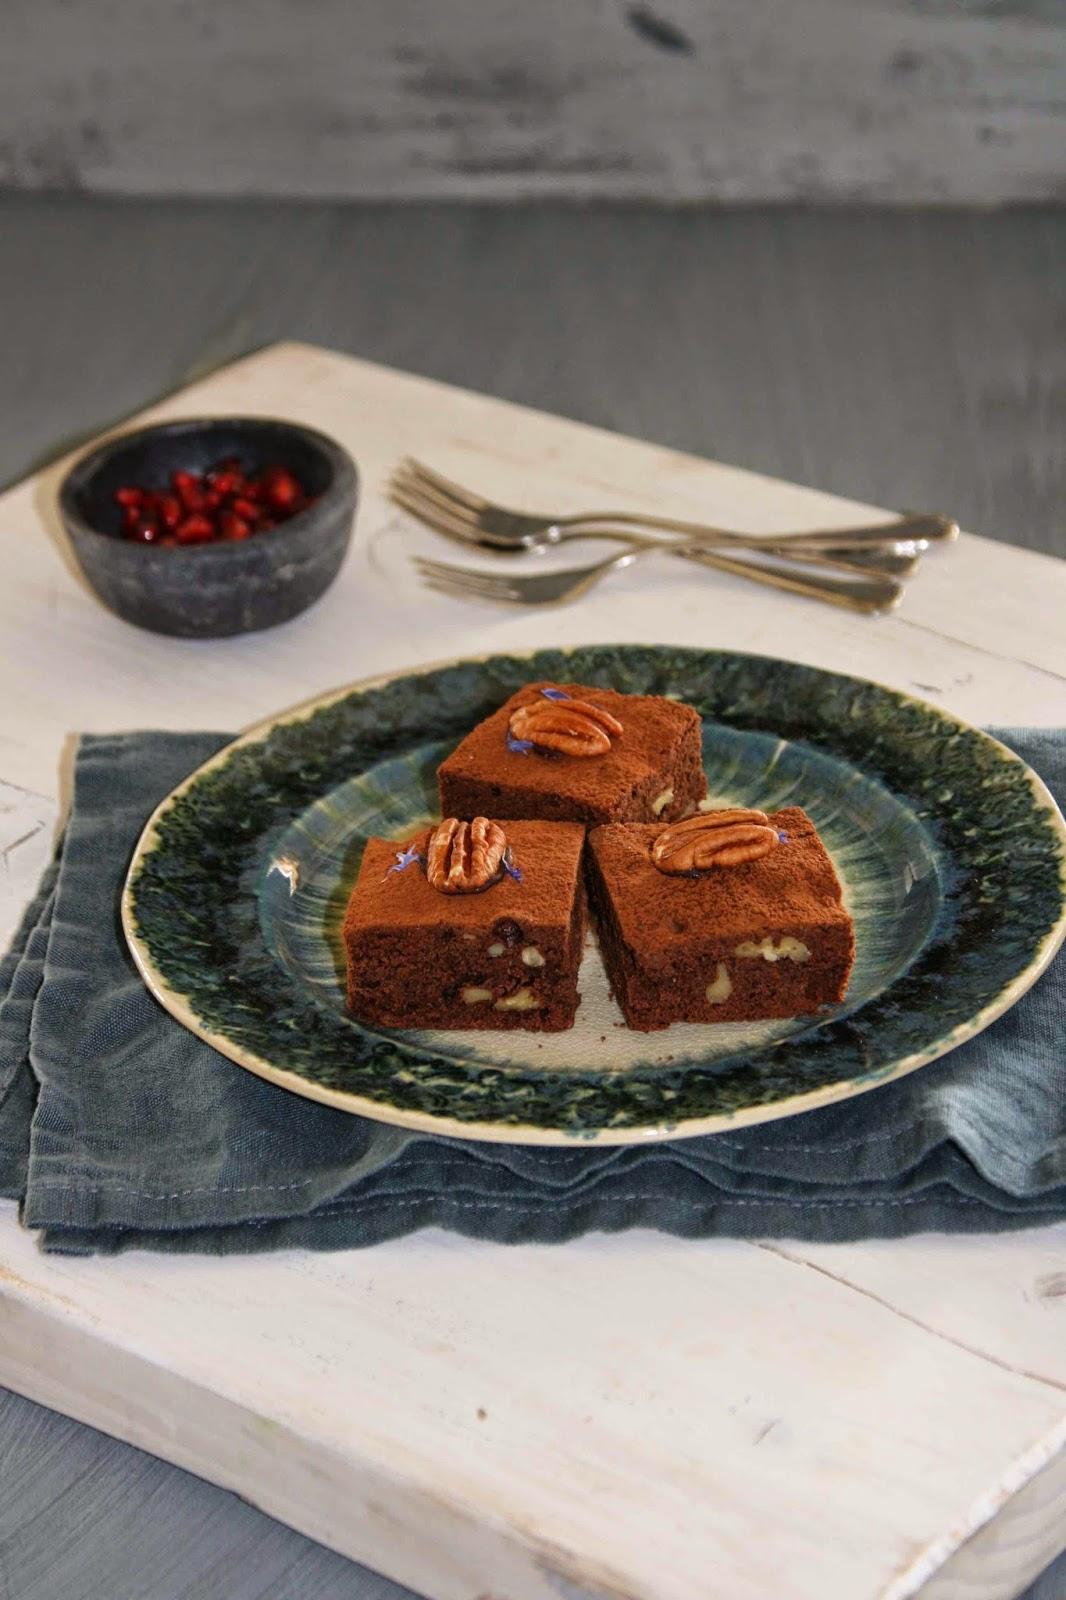 Workshop foodfotografie & styling brownies